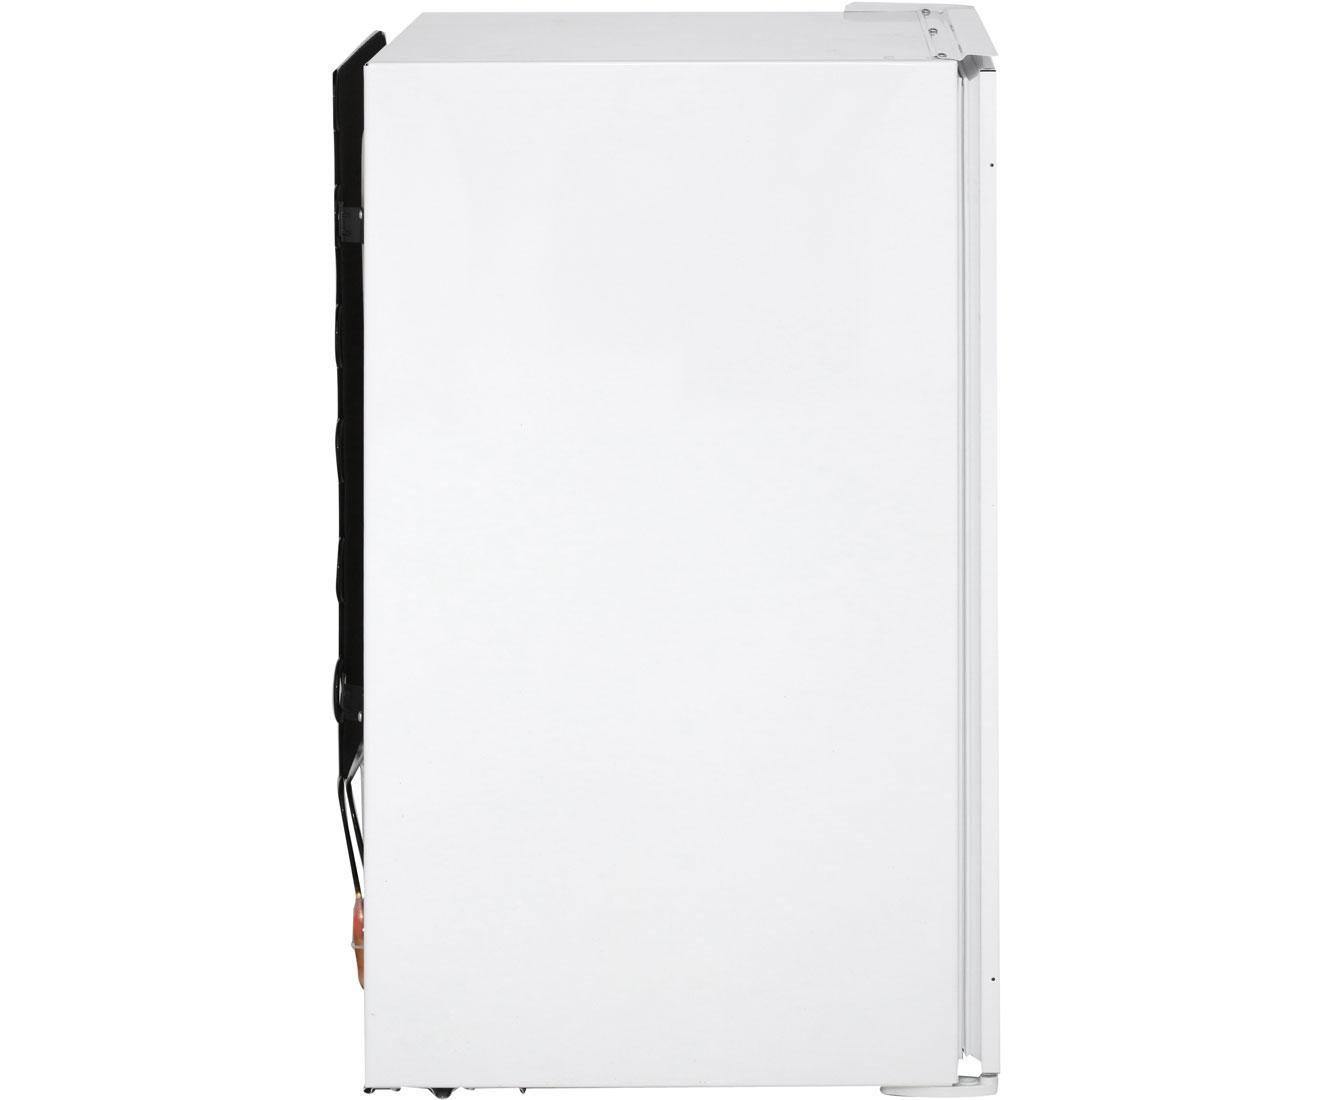 Gorenje Kühlschrank Stufen : Gorenje kühlschrank stufen: kühlschrank kühlt nicht mehr: ursachen